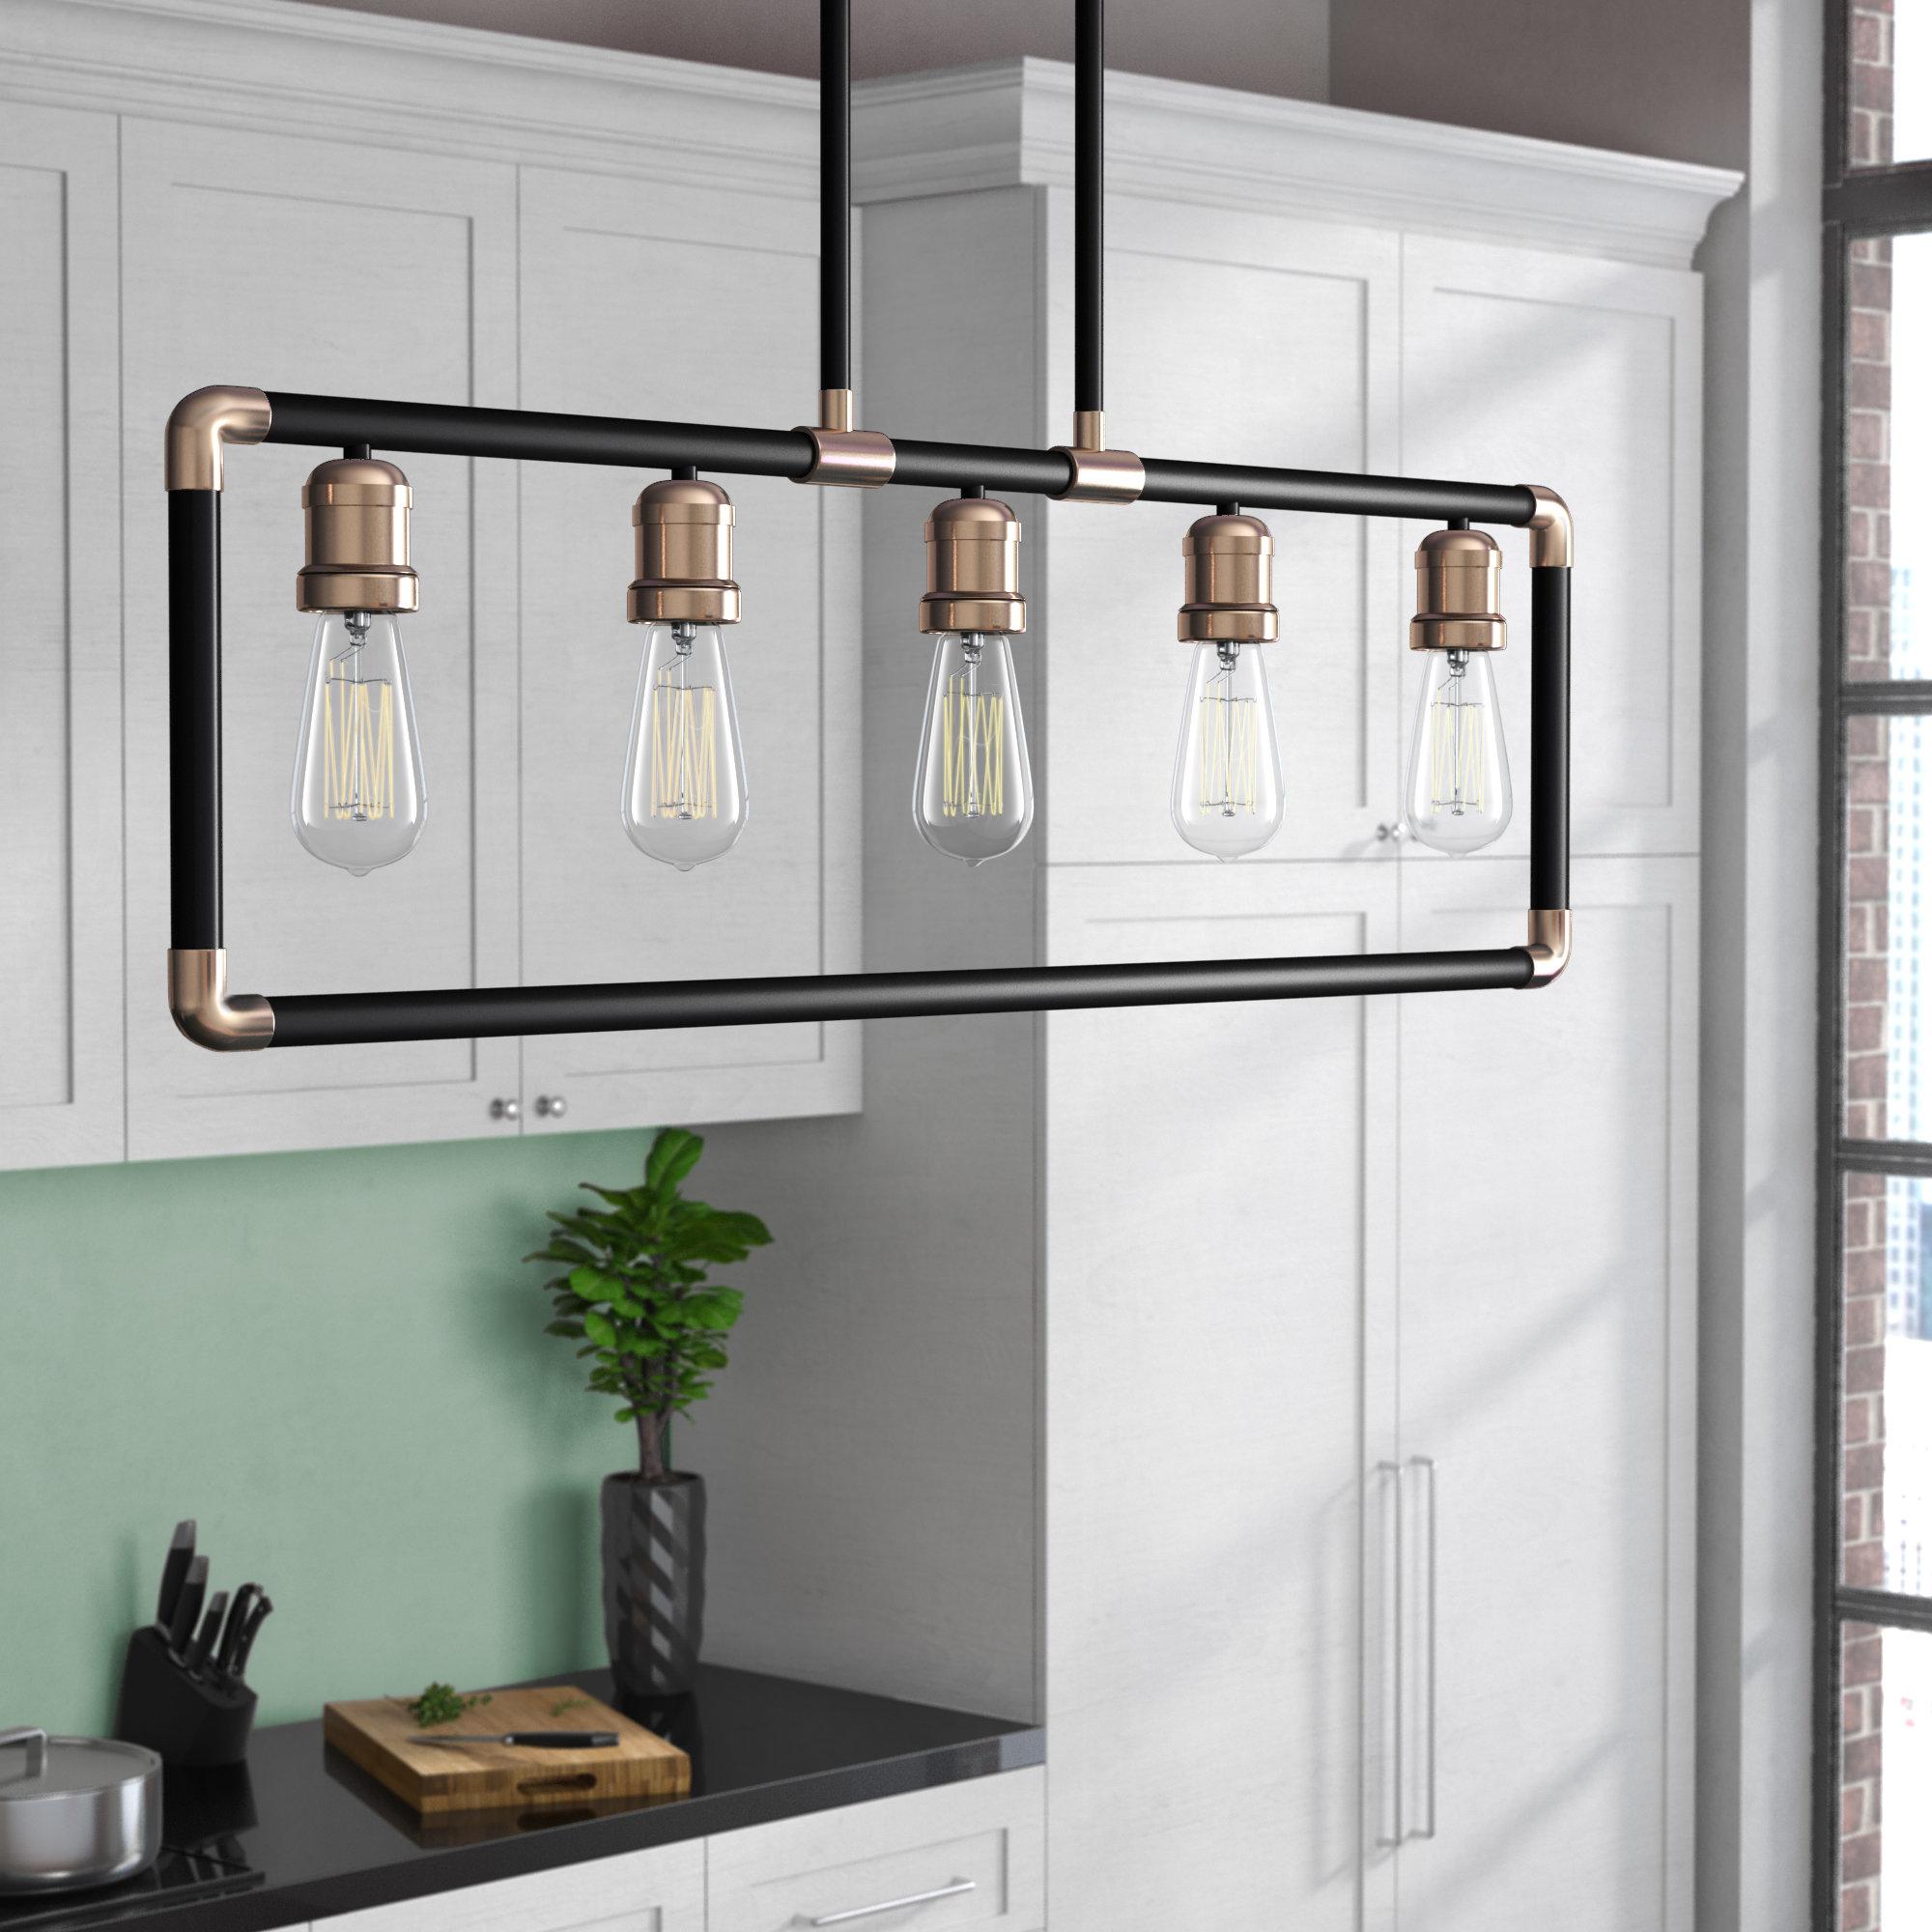 2019 Jefferson 4 Light Kitchen Island Linear Pendants For Abree 5 Light Kitchen Island Pendant (View 19 of 20)